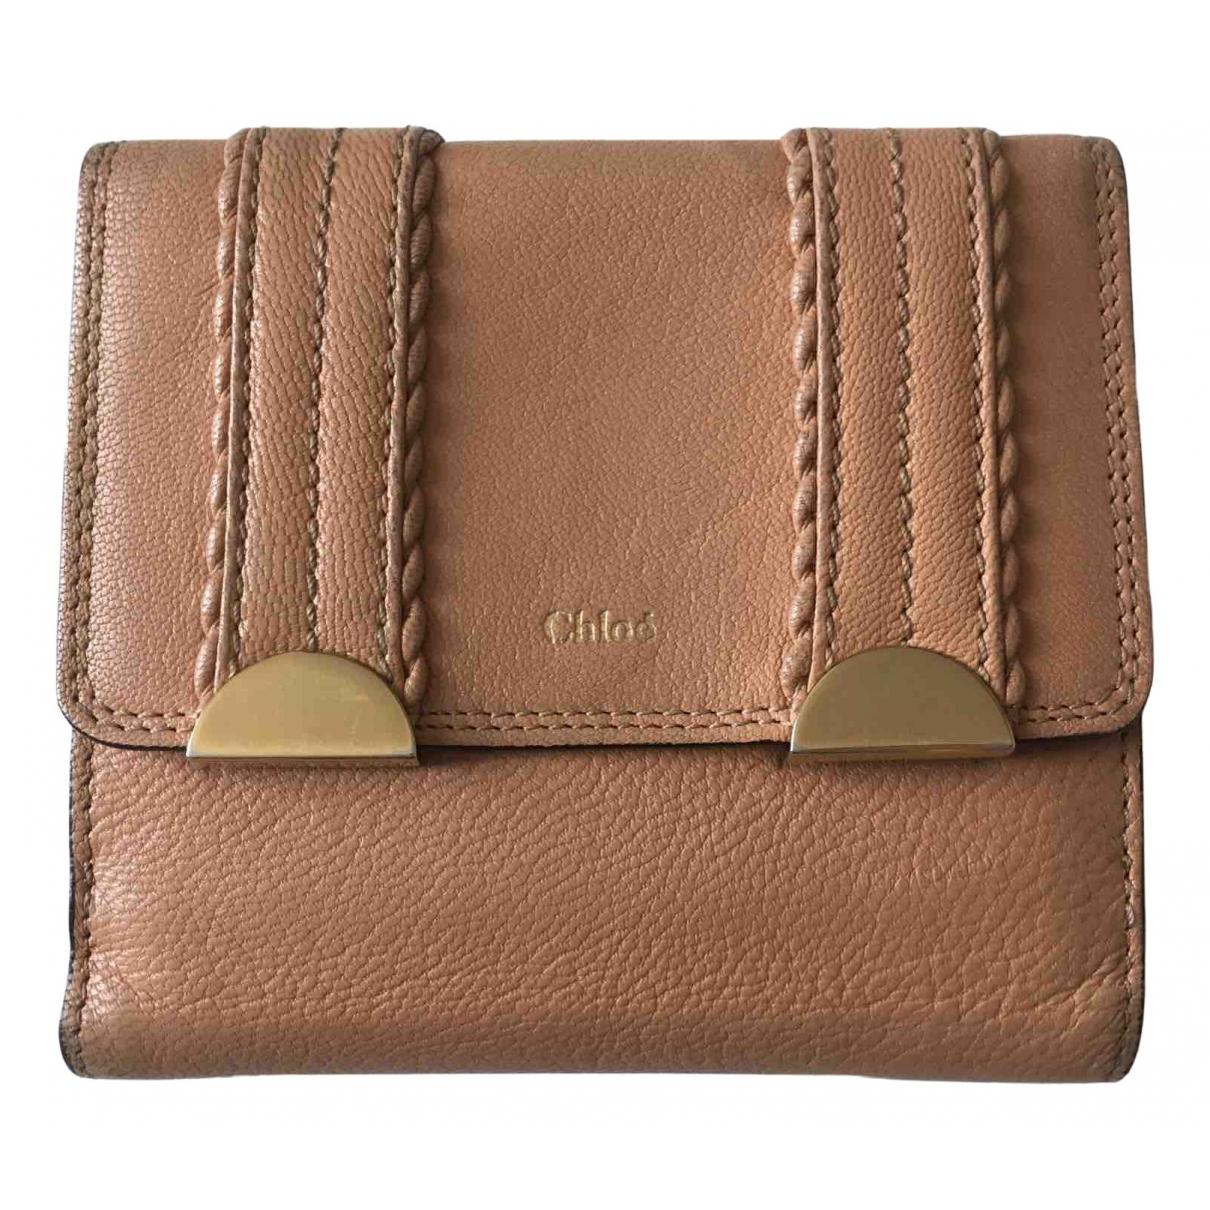 Chloe - Petite maroquinerie   pour femme en cuir - rose